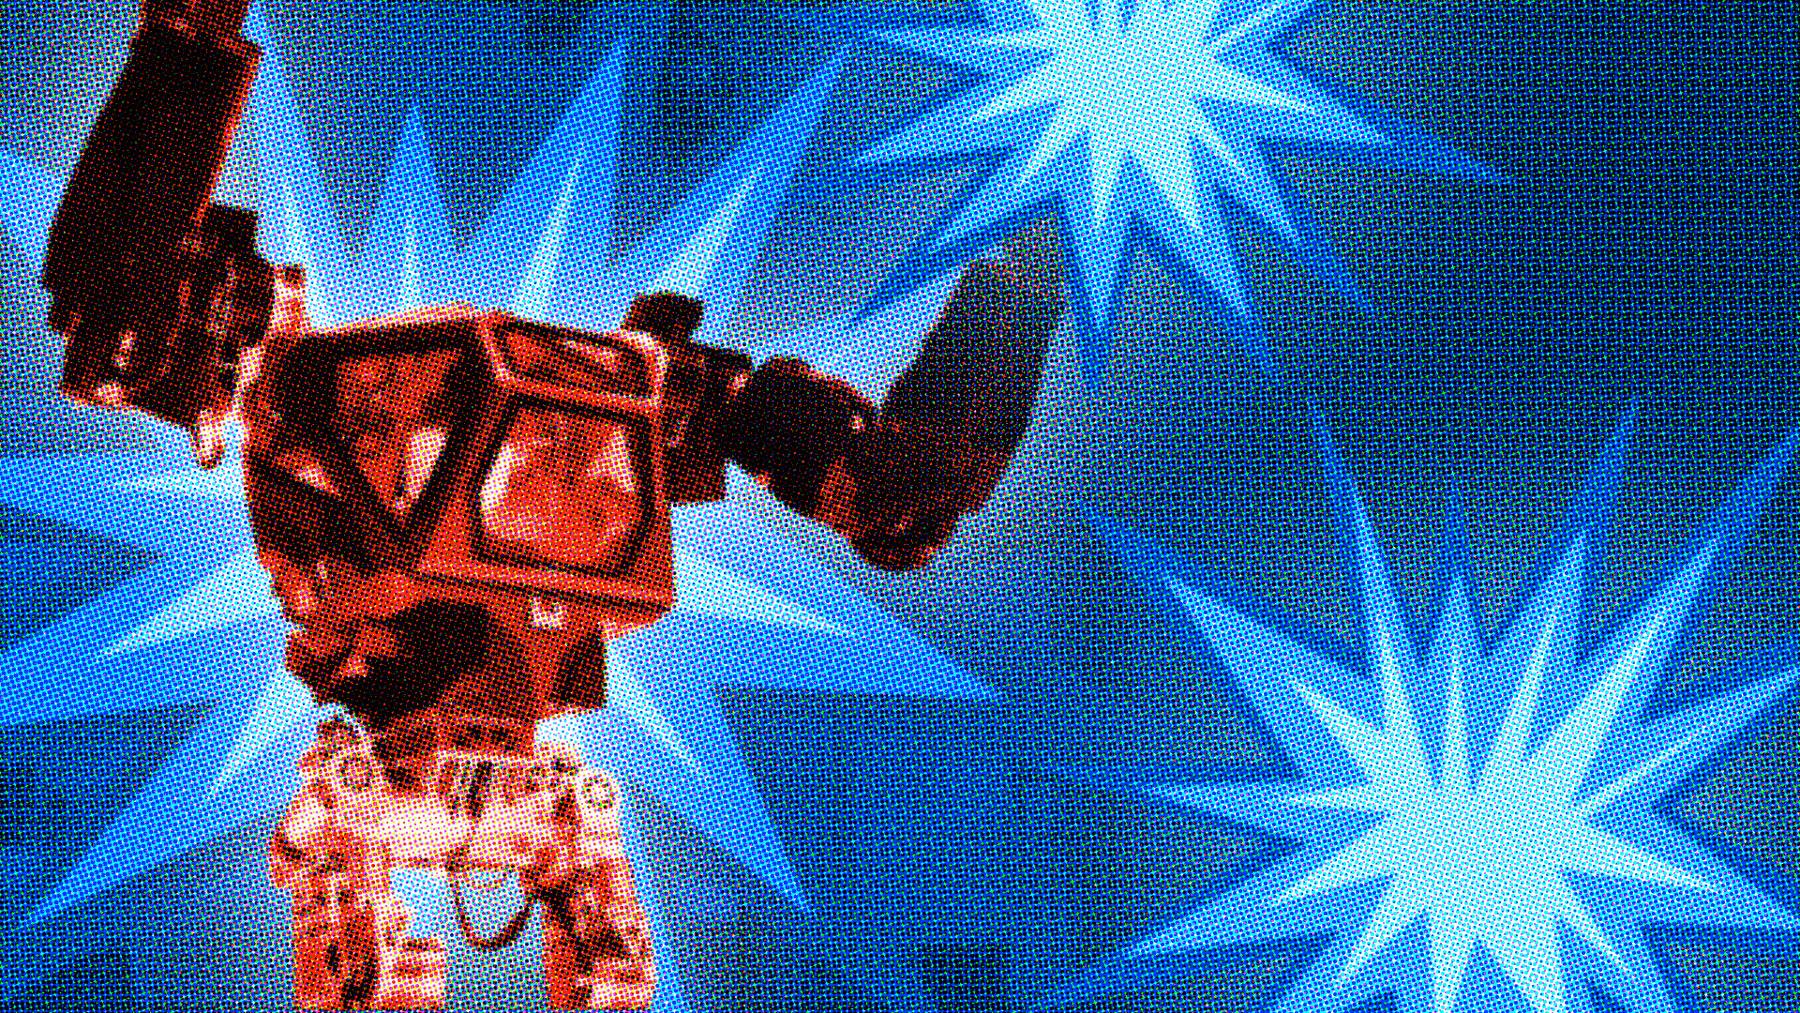 robot_thumb_utxt.jpg